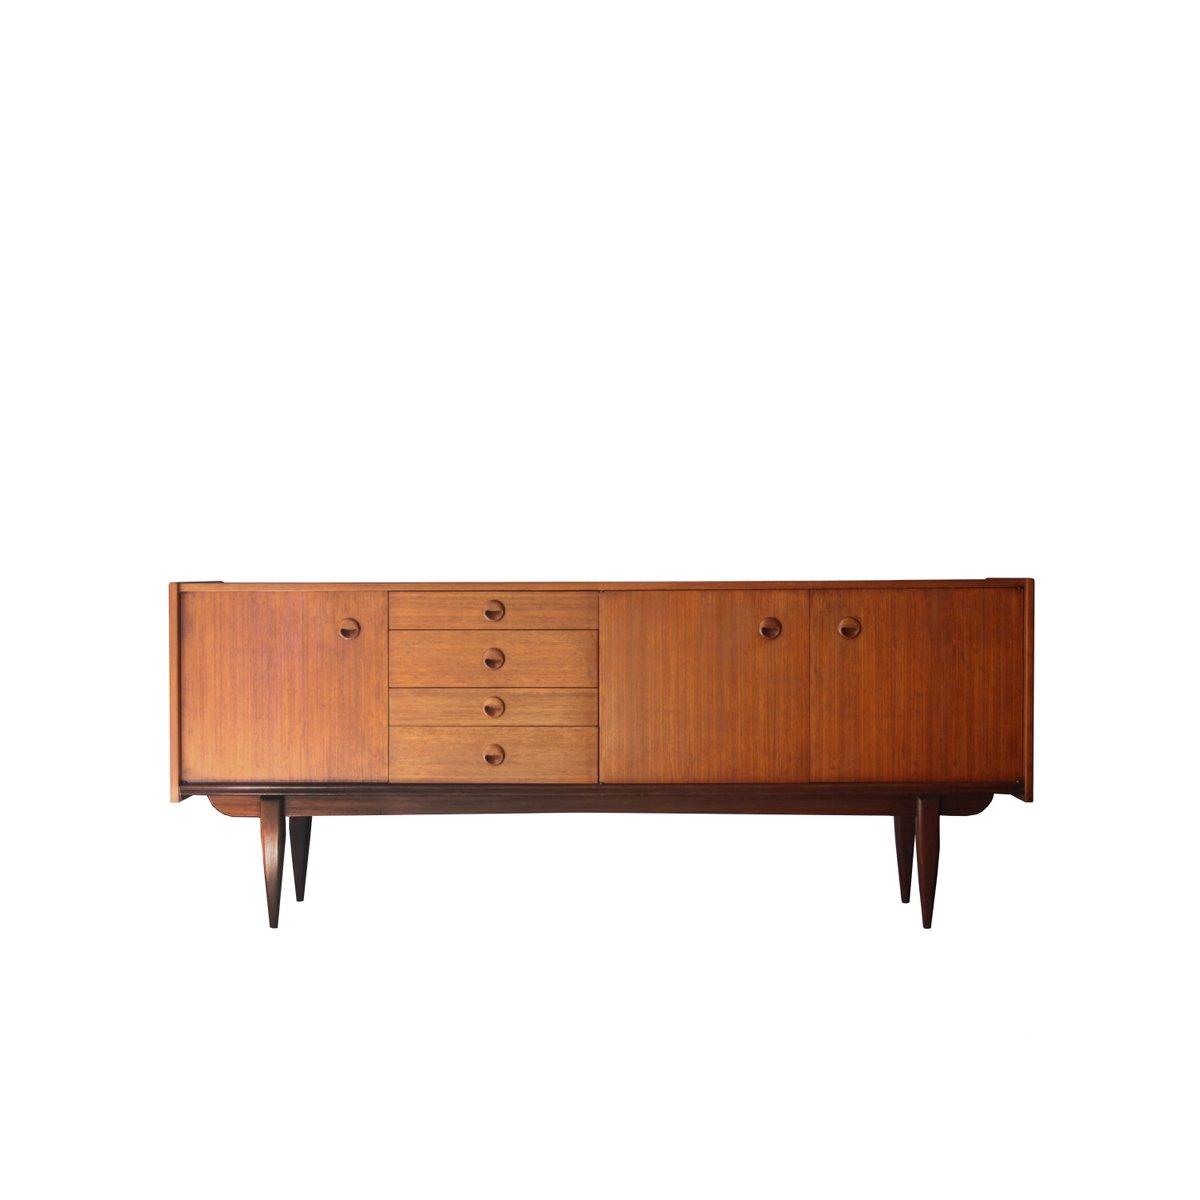 Walnuss Furnier Sideboard, 1950er